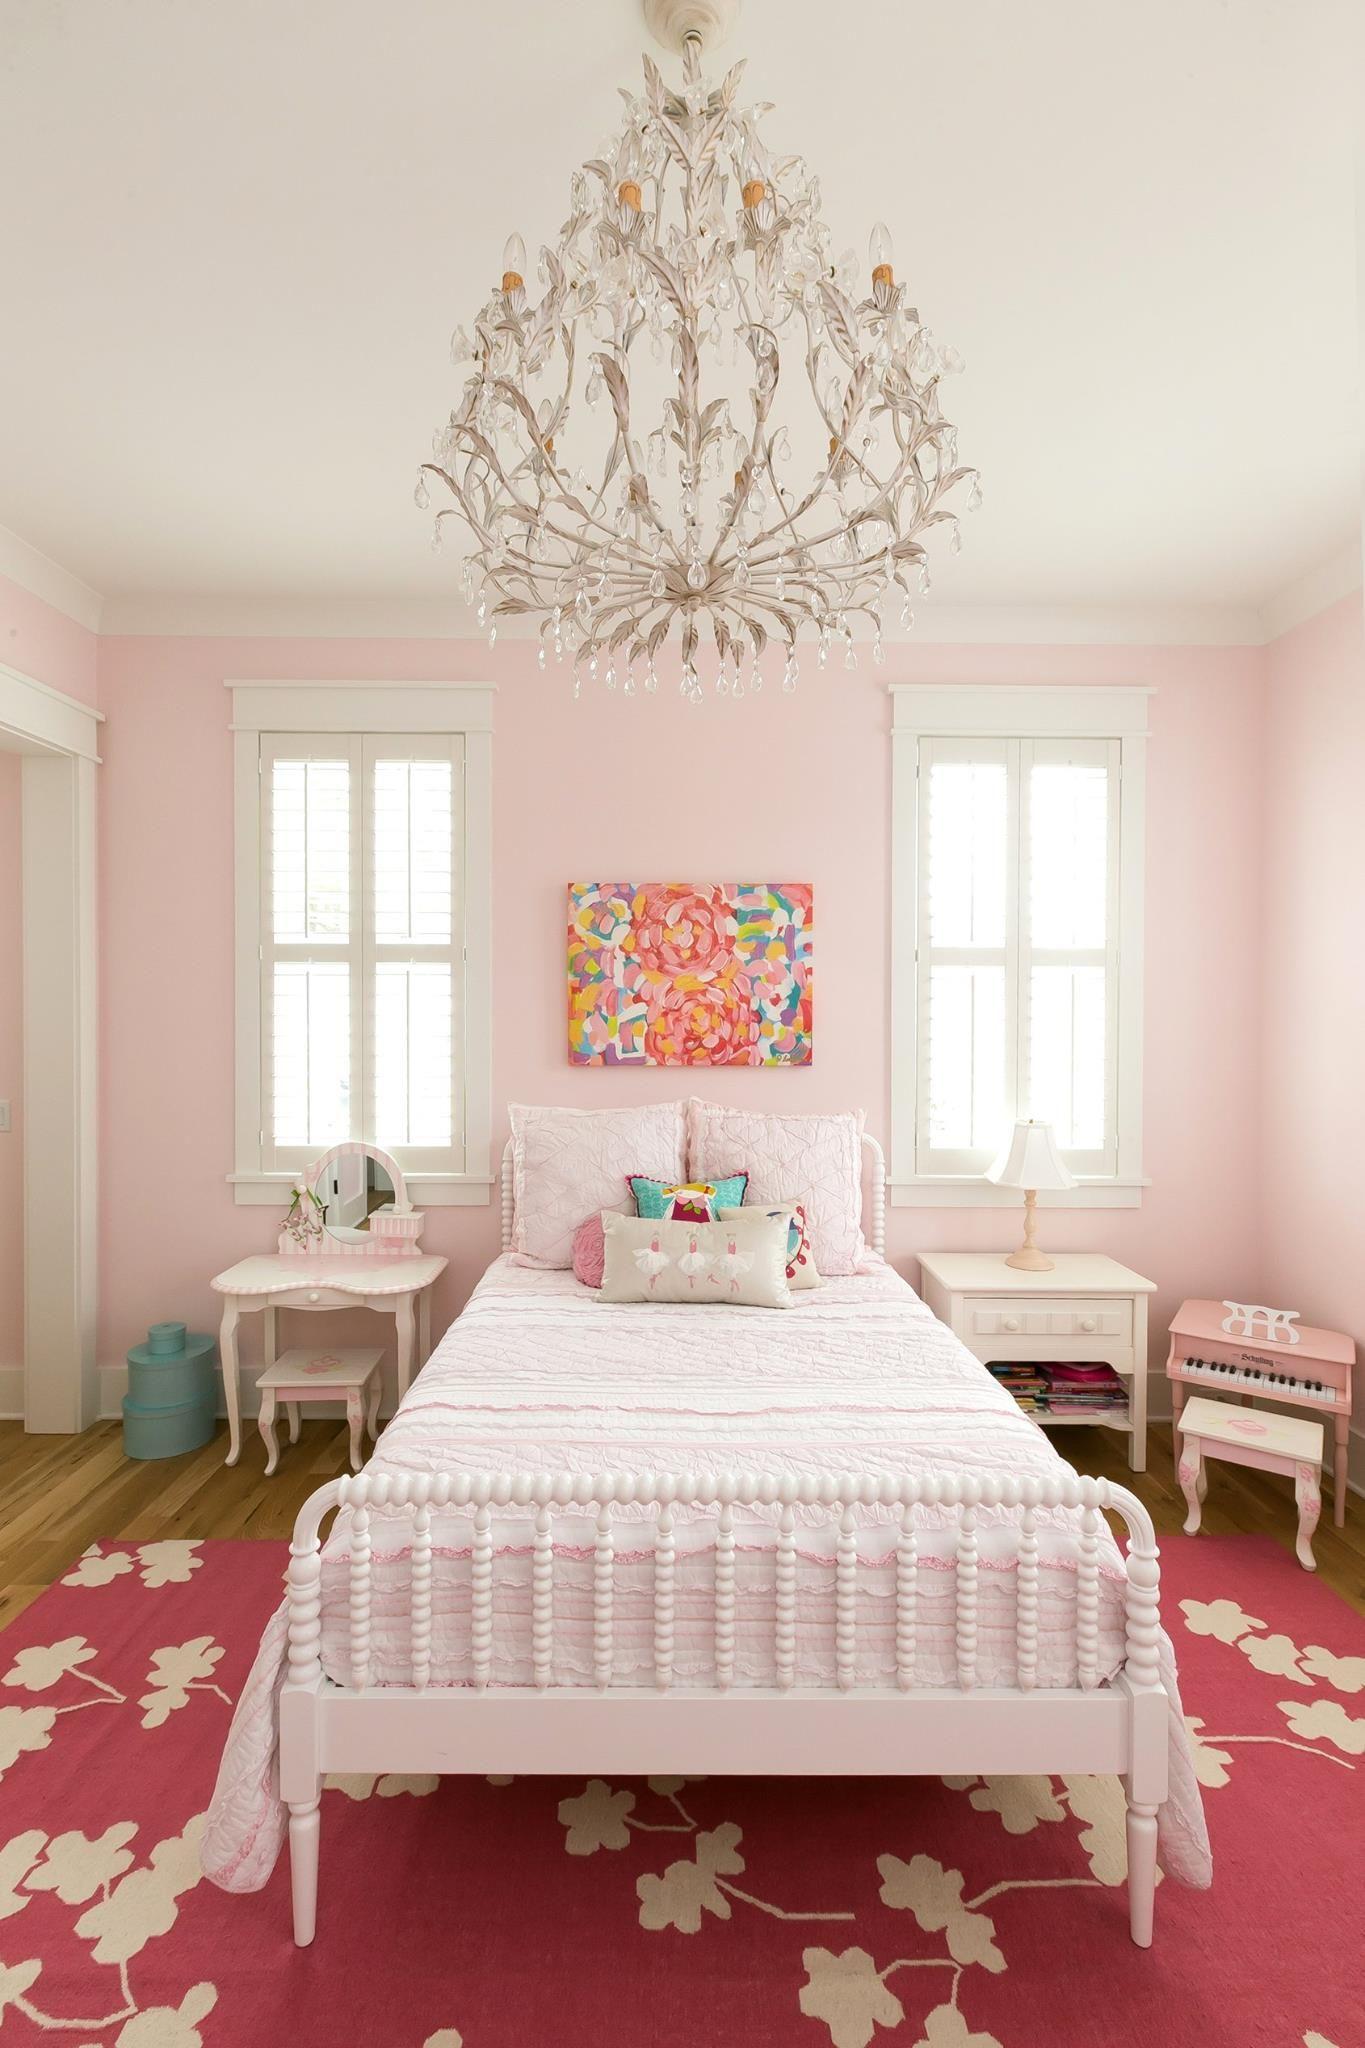 Girls Room Chandelier White Antique Bed Dark Pink Rug Pale Pink